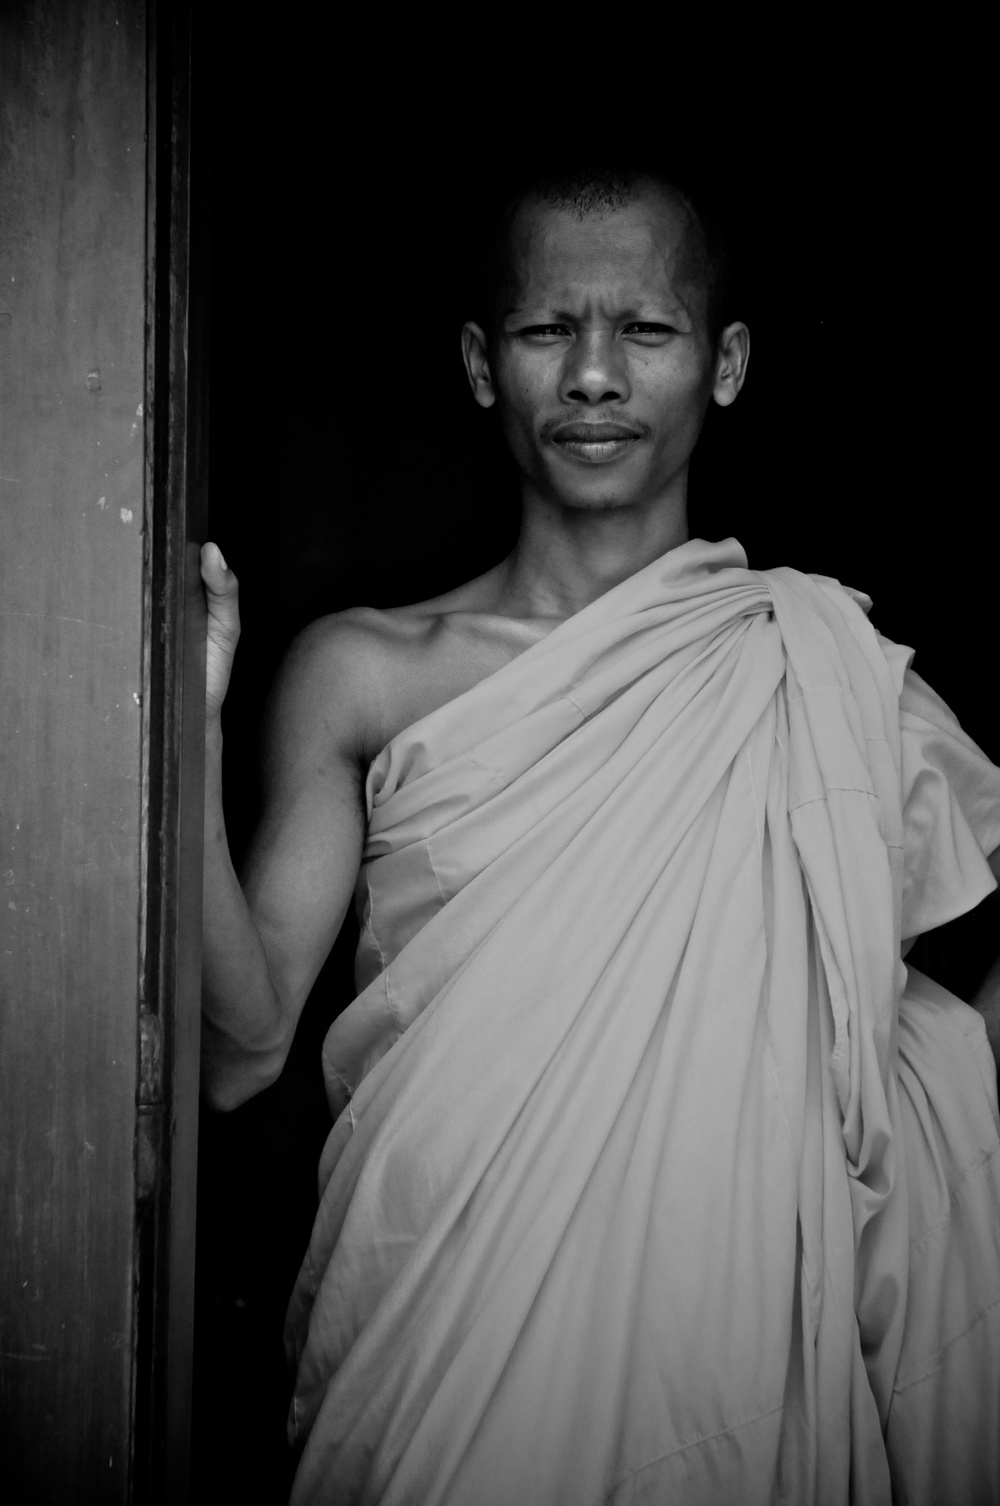 Monk at Wat Ounalom, Phnom Penh, Cambodia